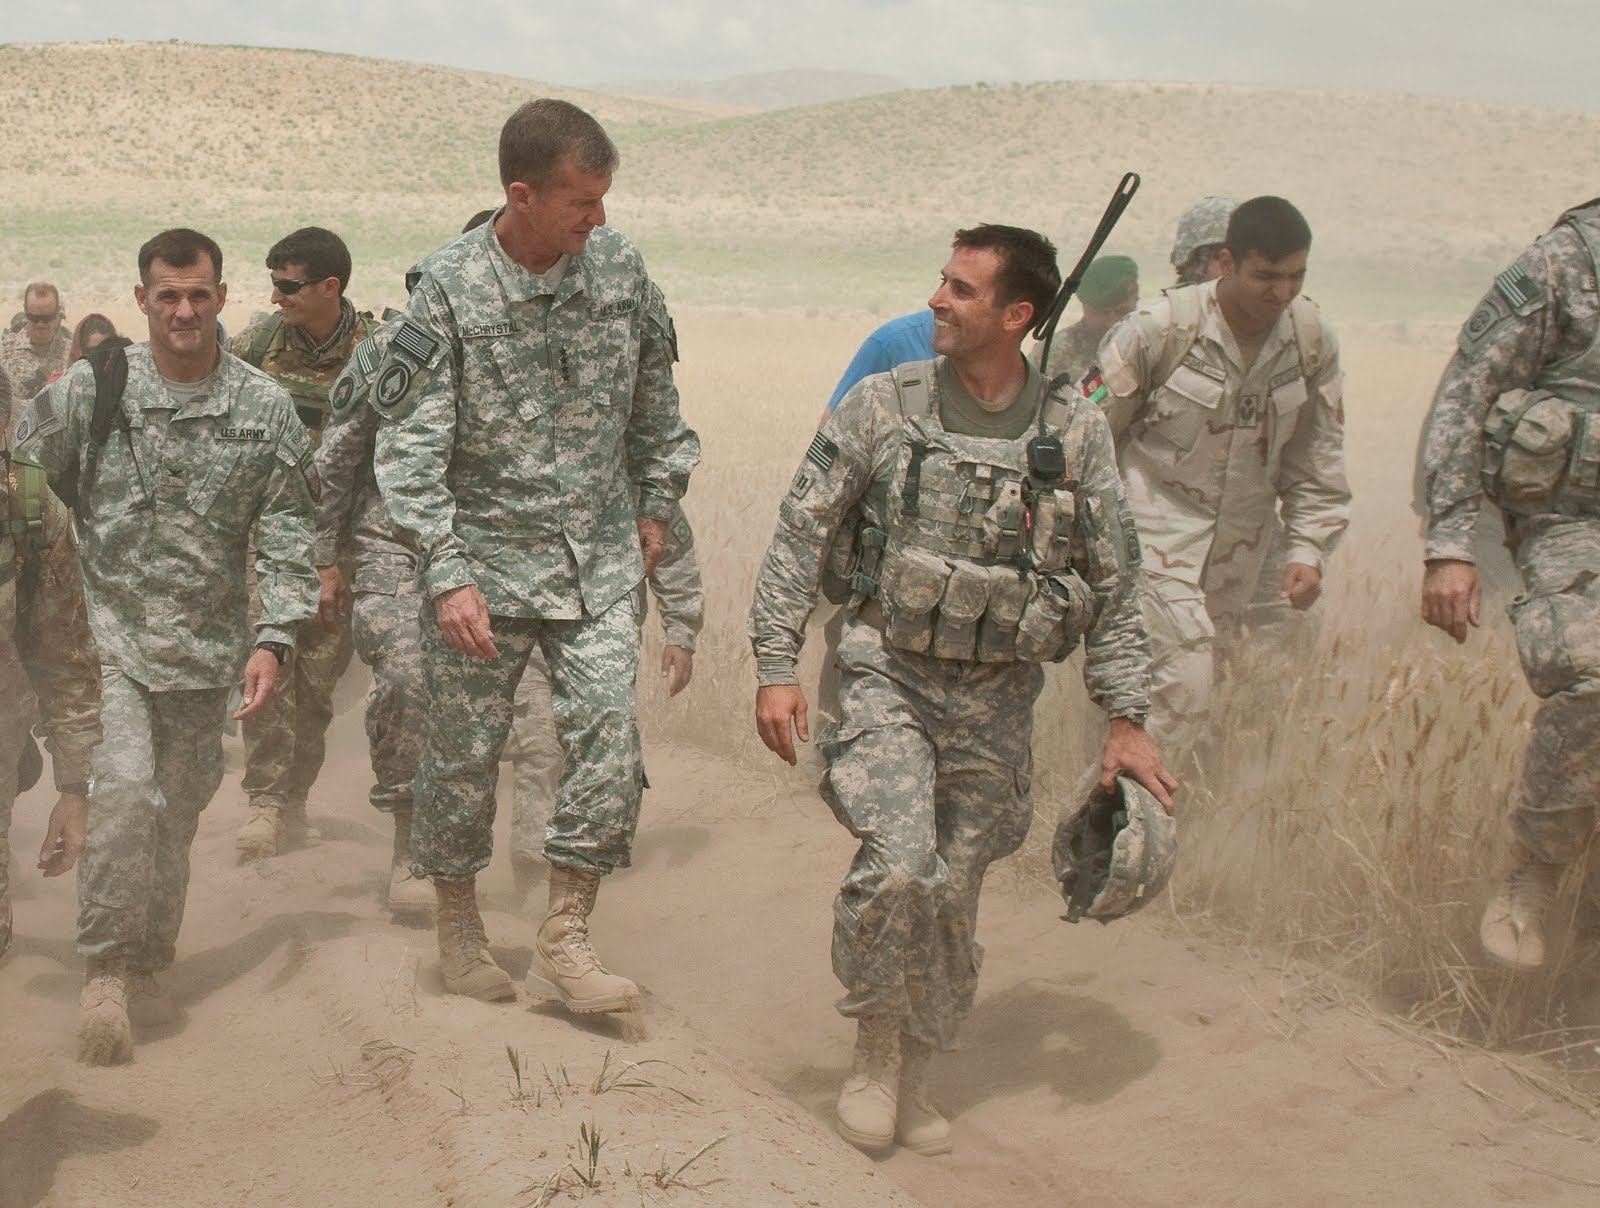 Mcchrystal rolling stone